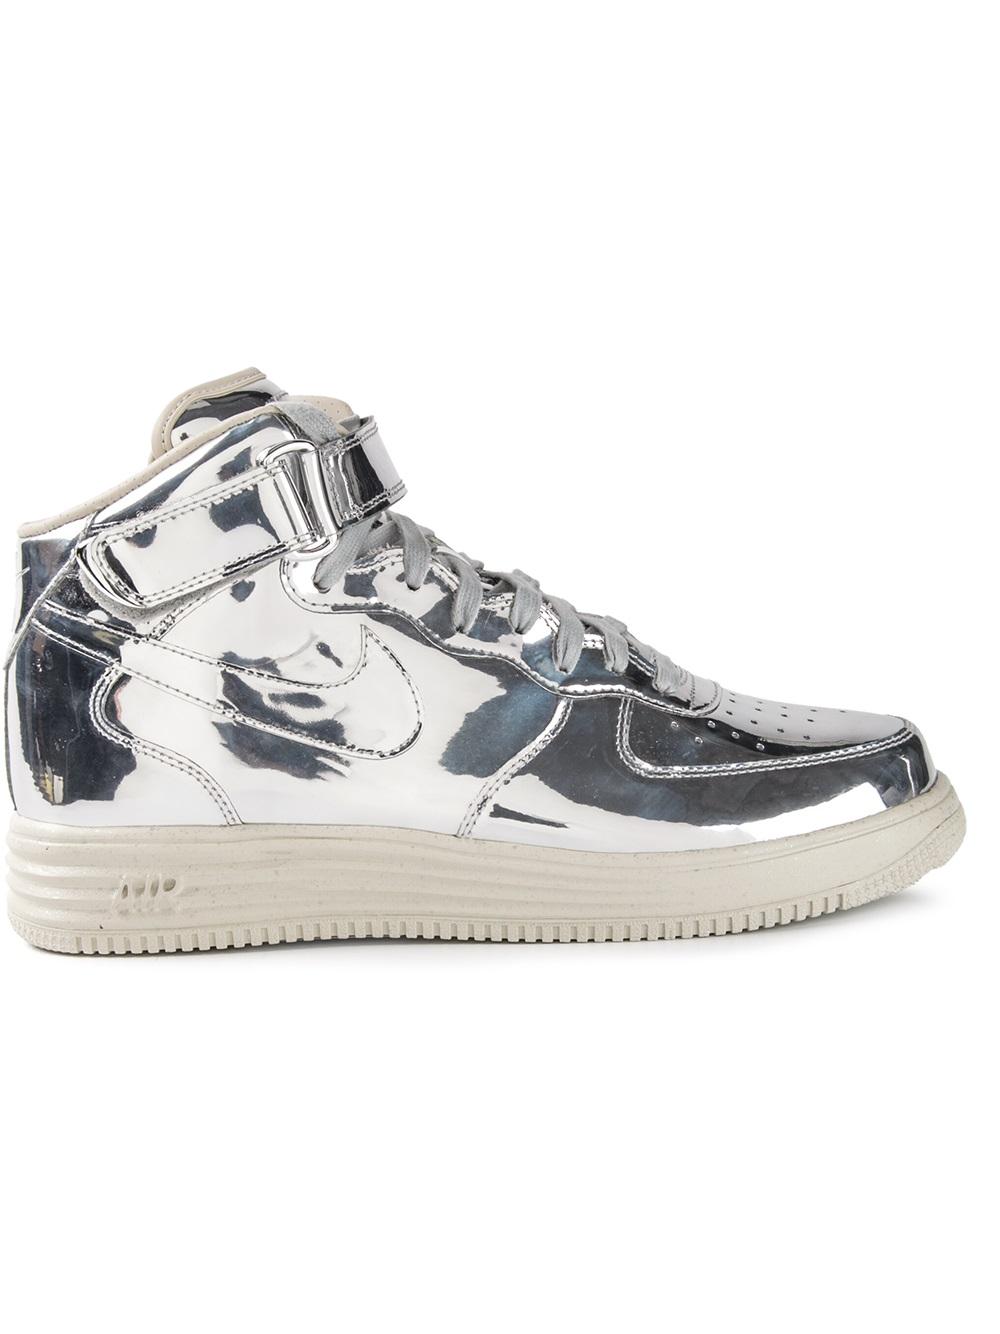 Nike Air Force 1 Midtop Sneakers In Metallic For Men Lyst